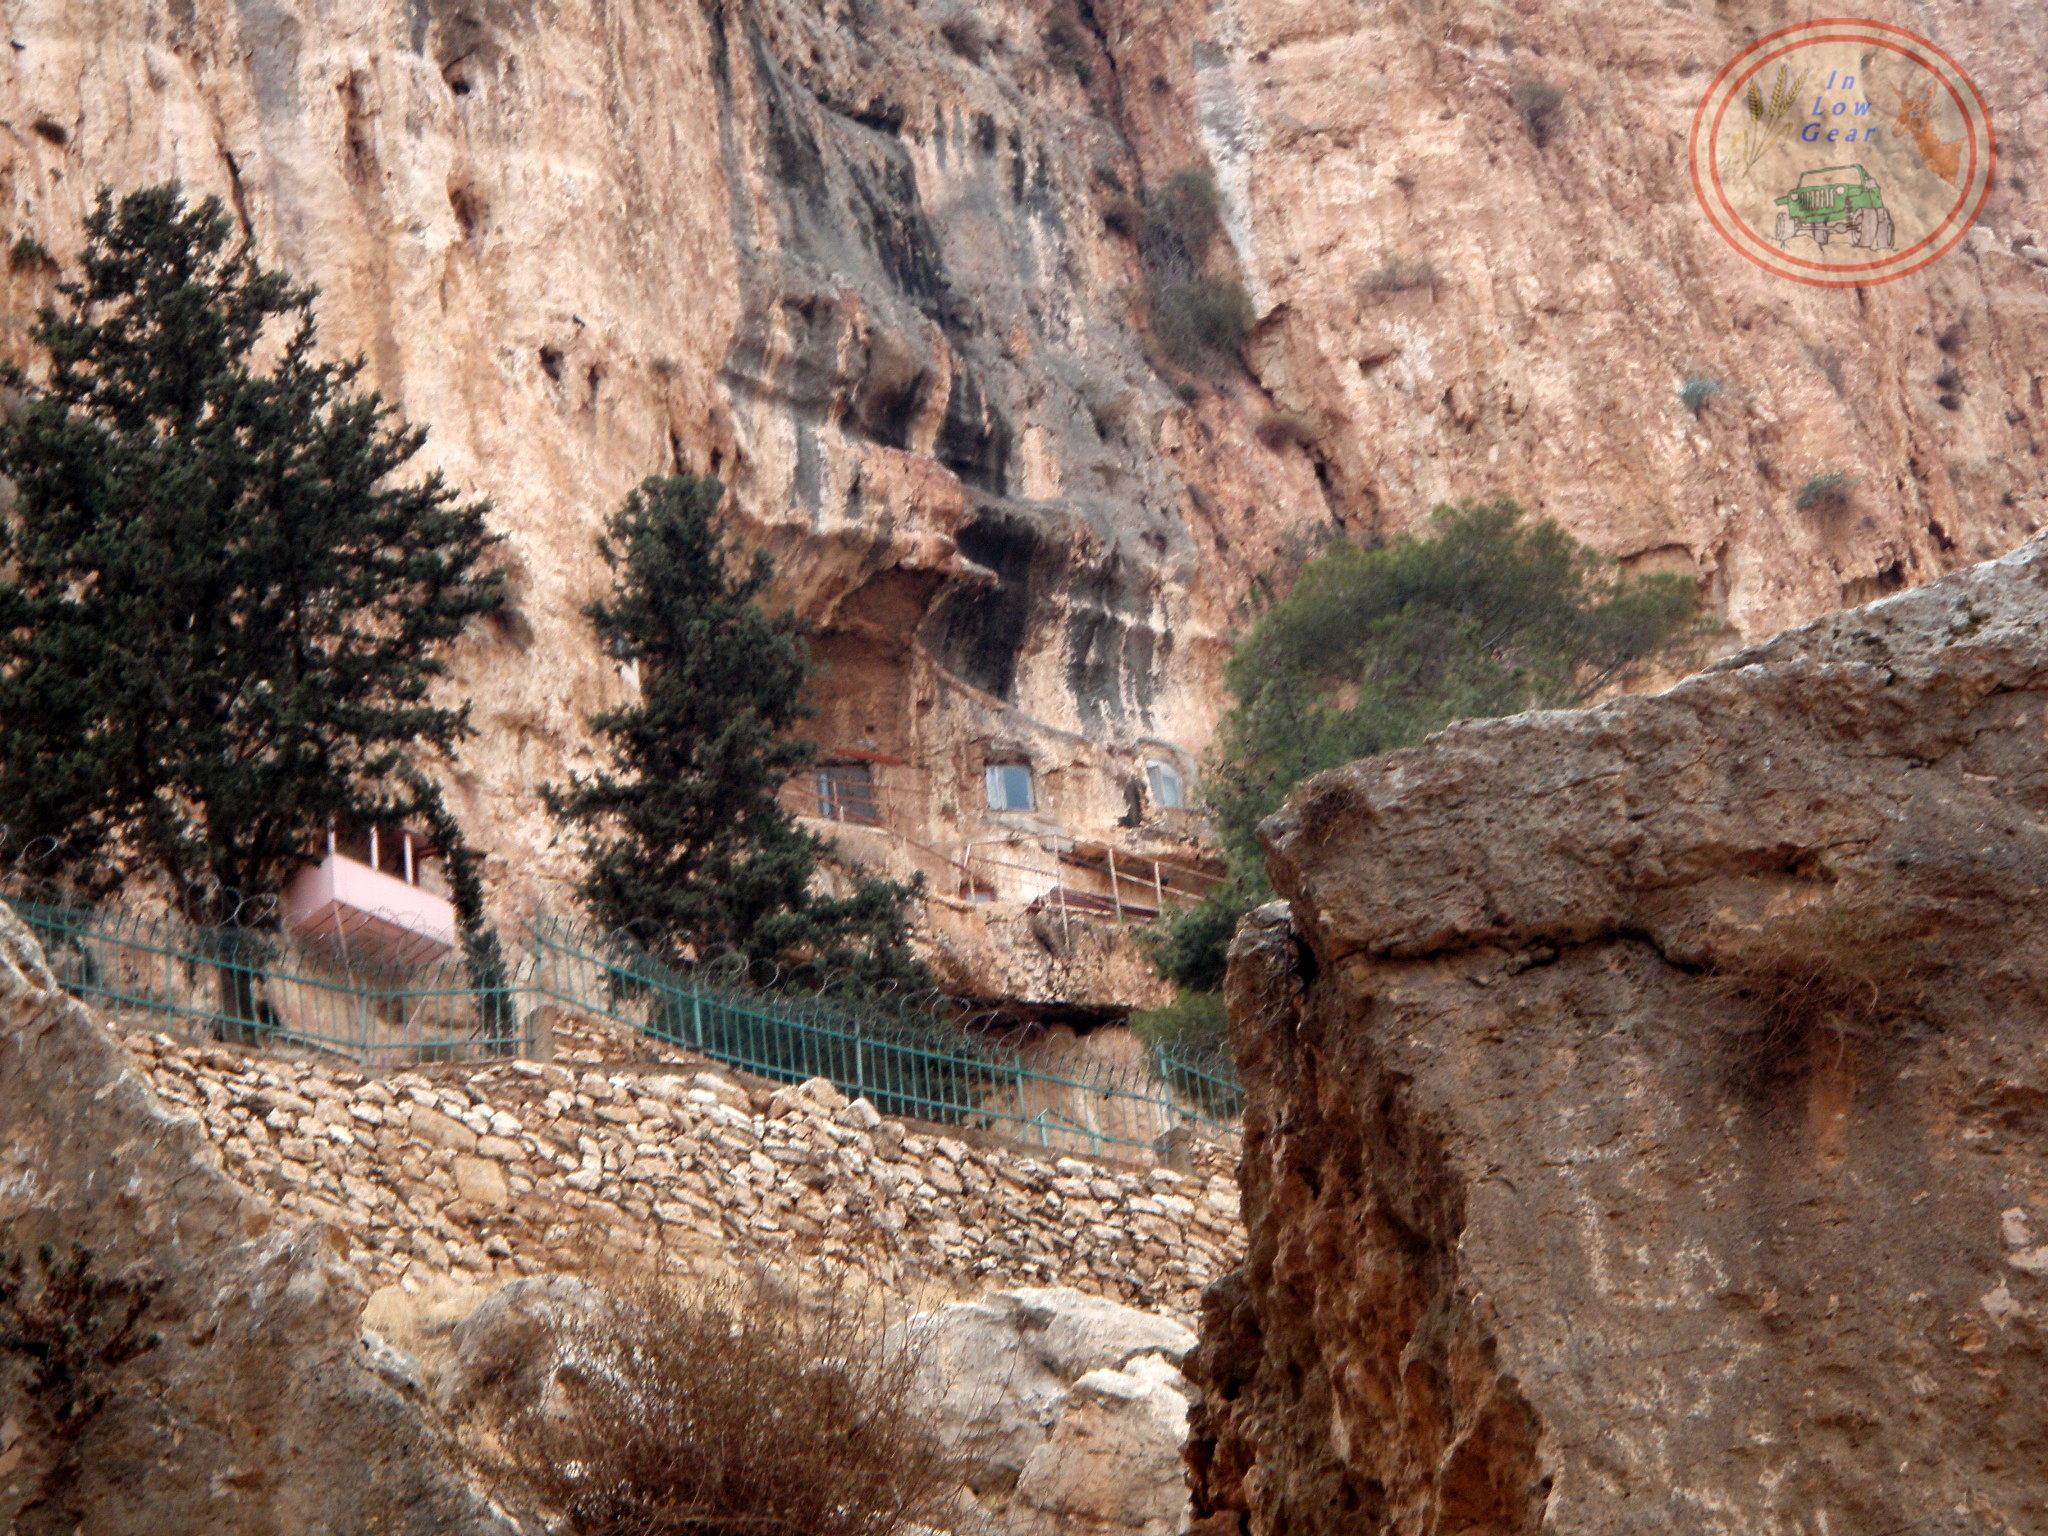 Firan monastery, lavra type, 330 AD at Ein Prat Judea desert.